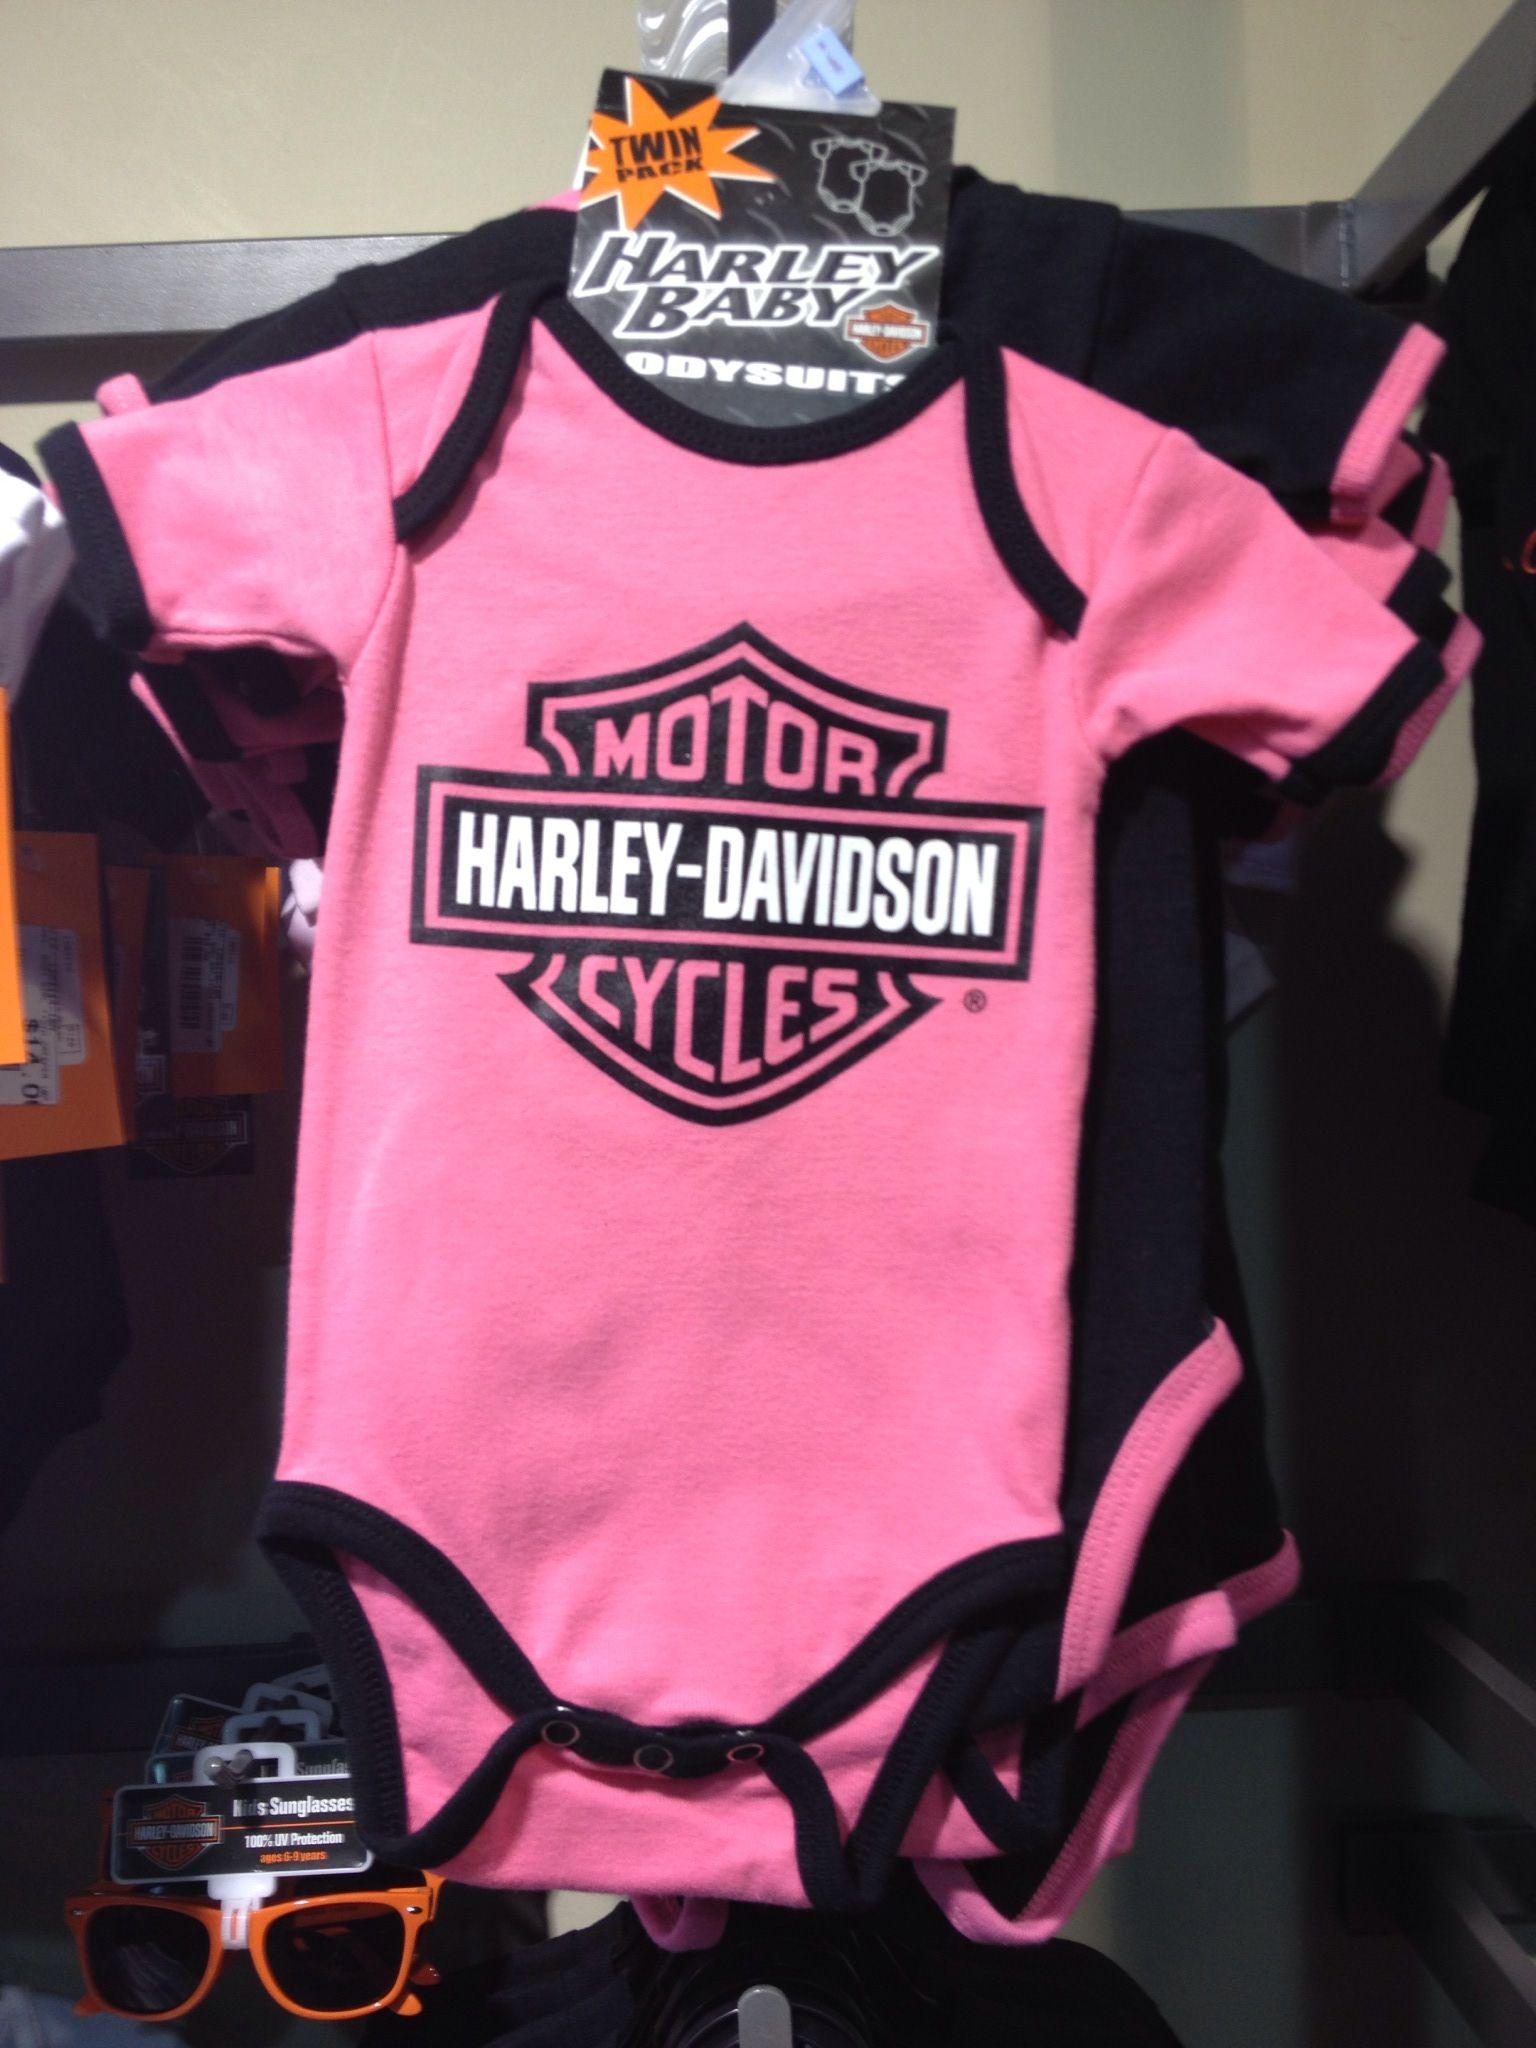 Super Cute Pink Harley Onesie Harley Davidson Kids Kids Outfits Motor Harley Davidson Cycles